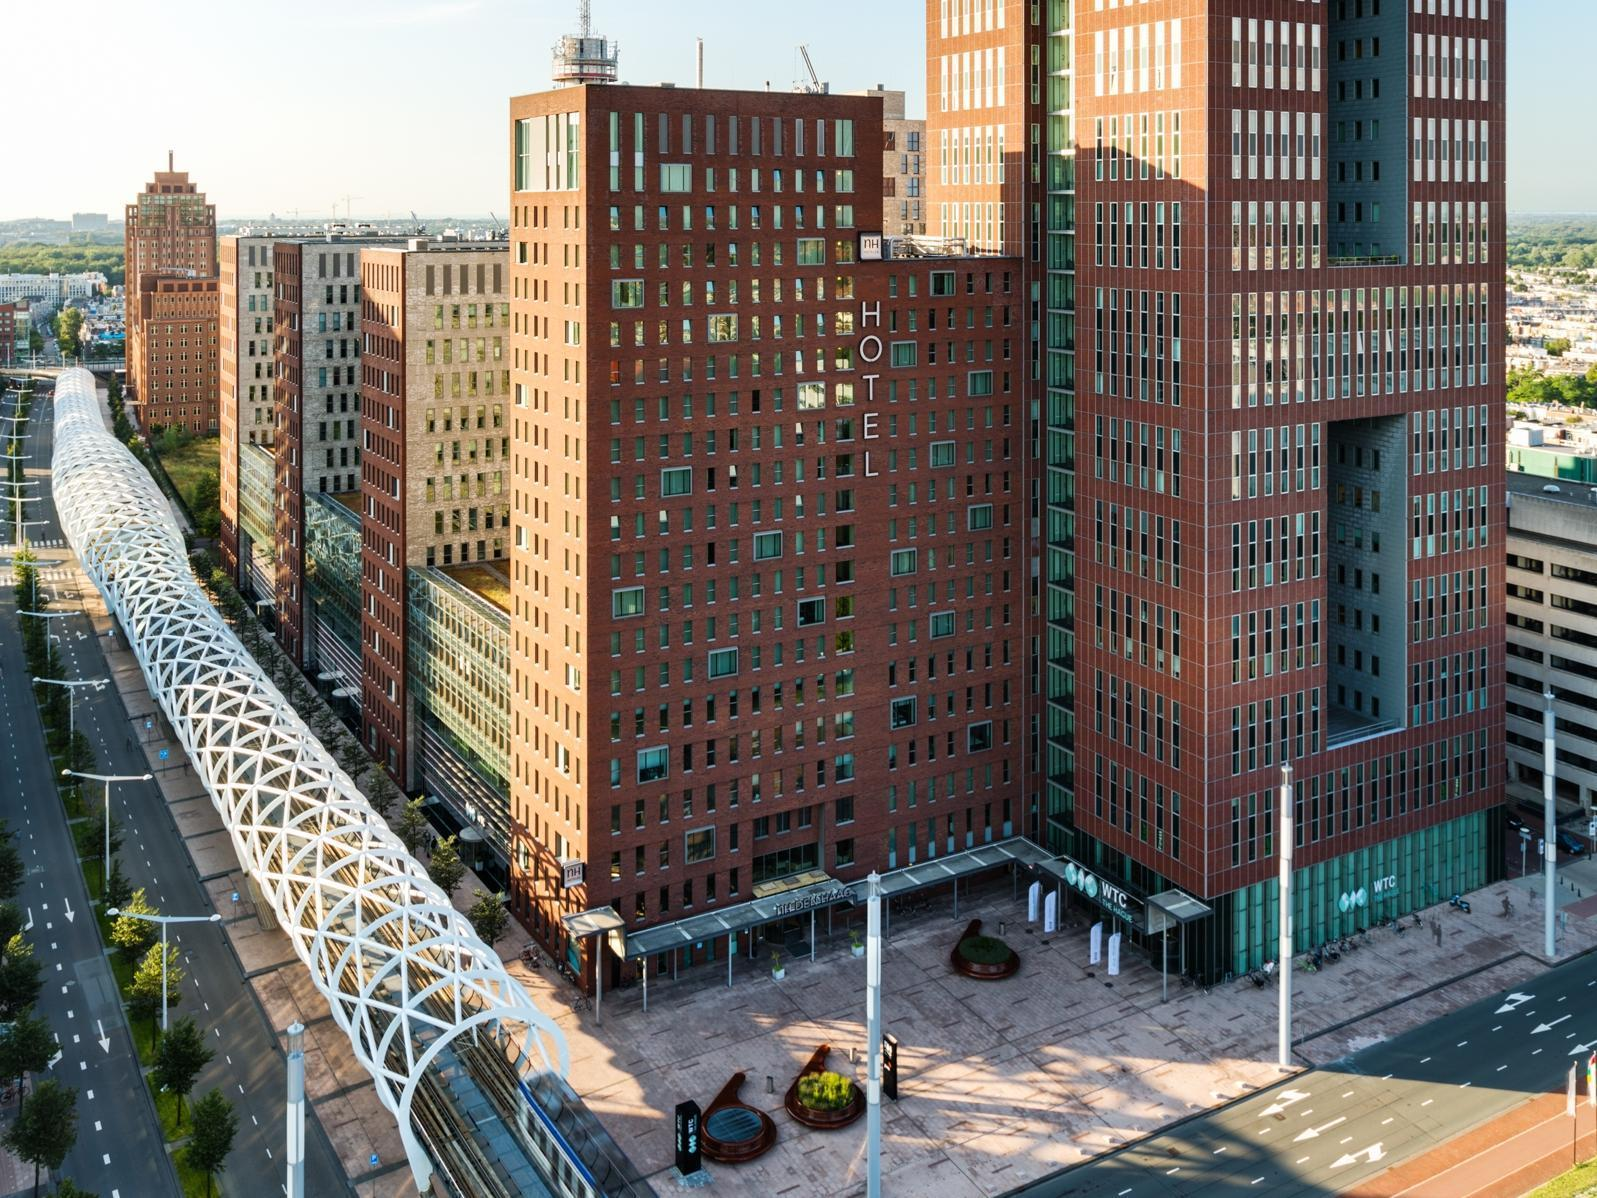 NH Den Haag Hotel